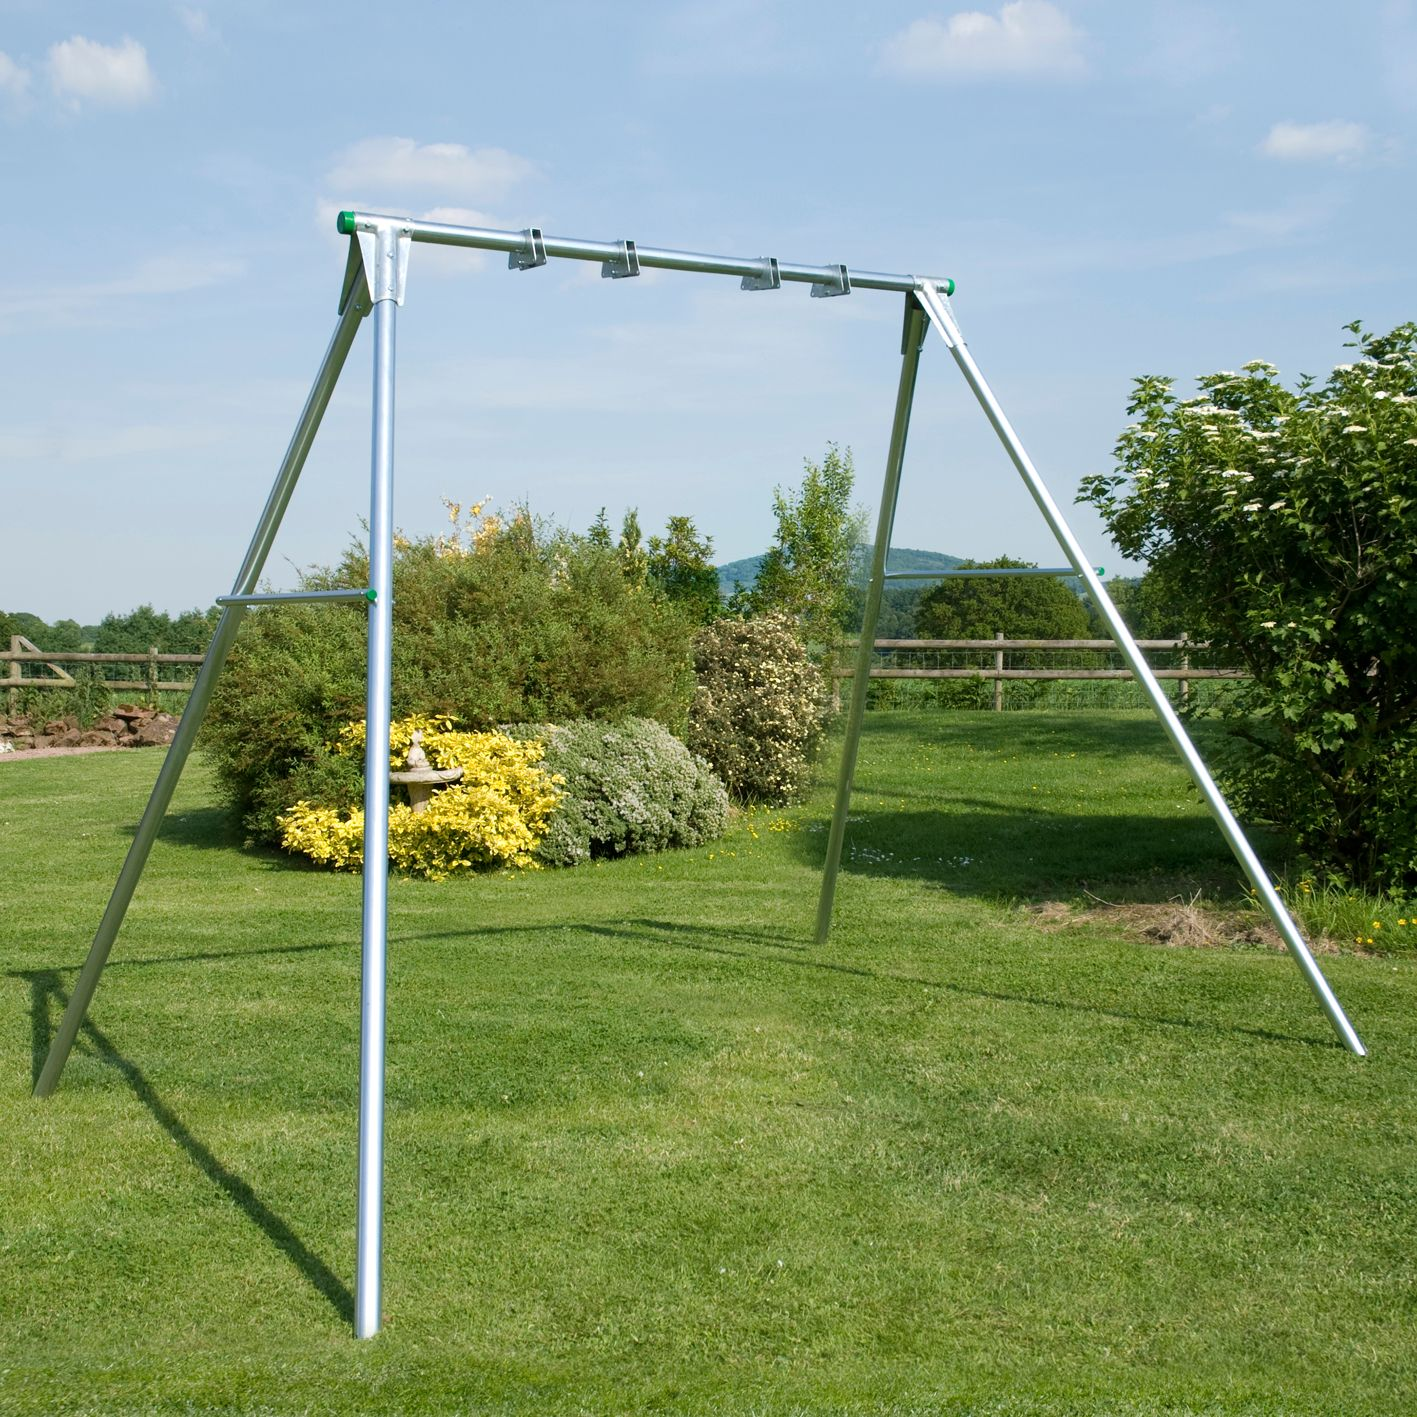 TP131 Double Giant Swing Frame